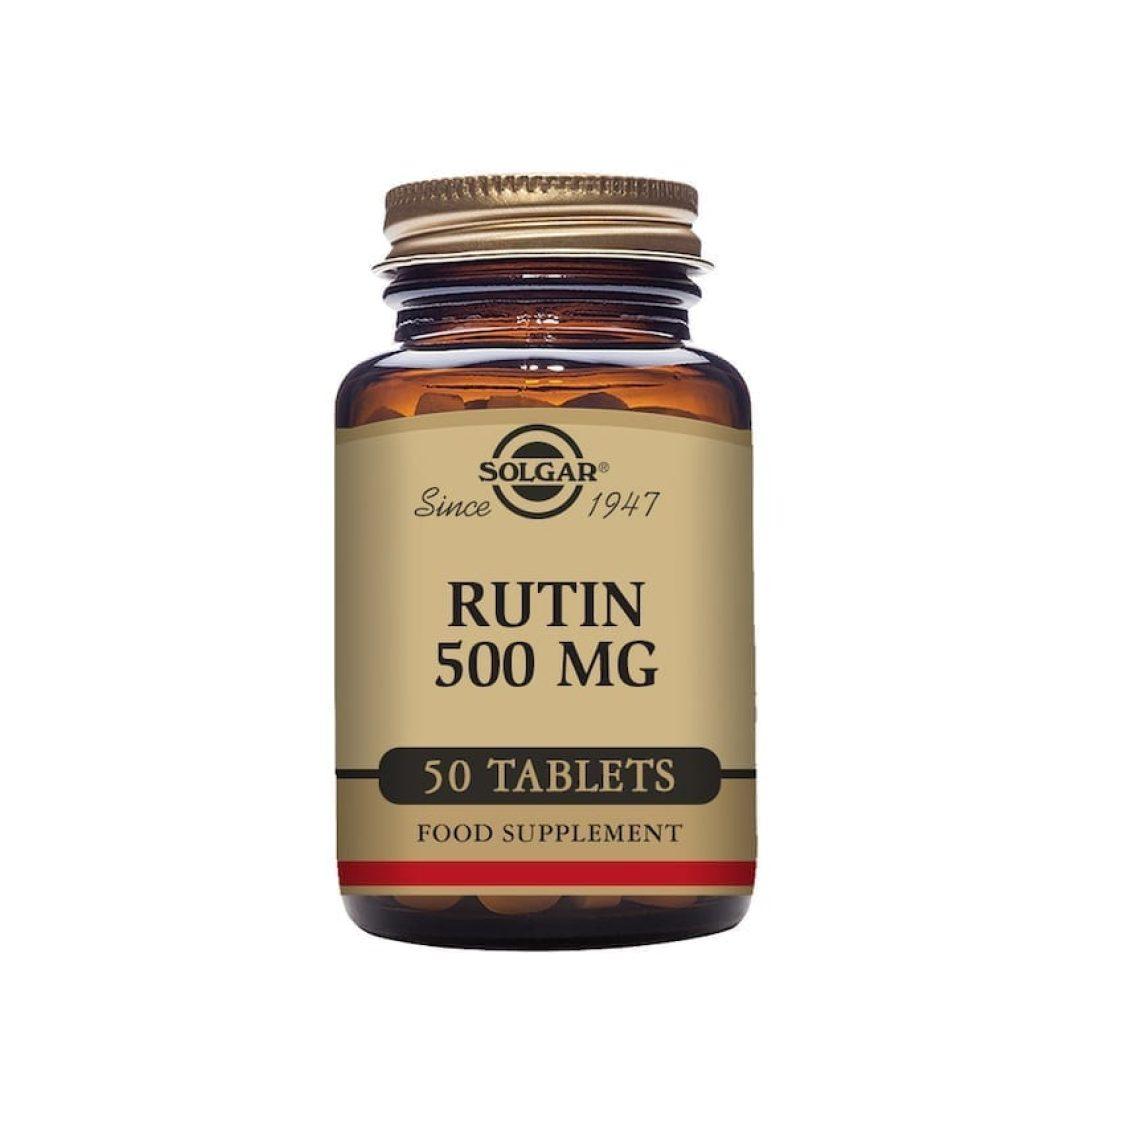 Solgar - Vitamin C / Bioflavonoids - Rutin 500mg Tabs - Size: 50